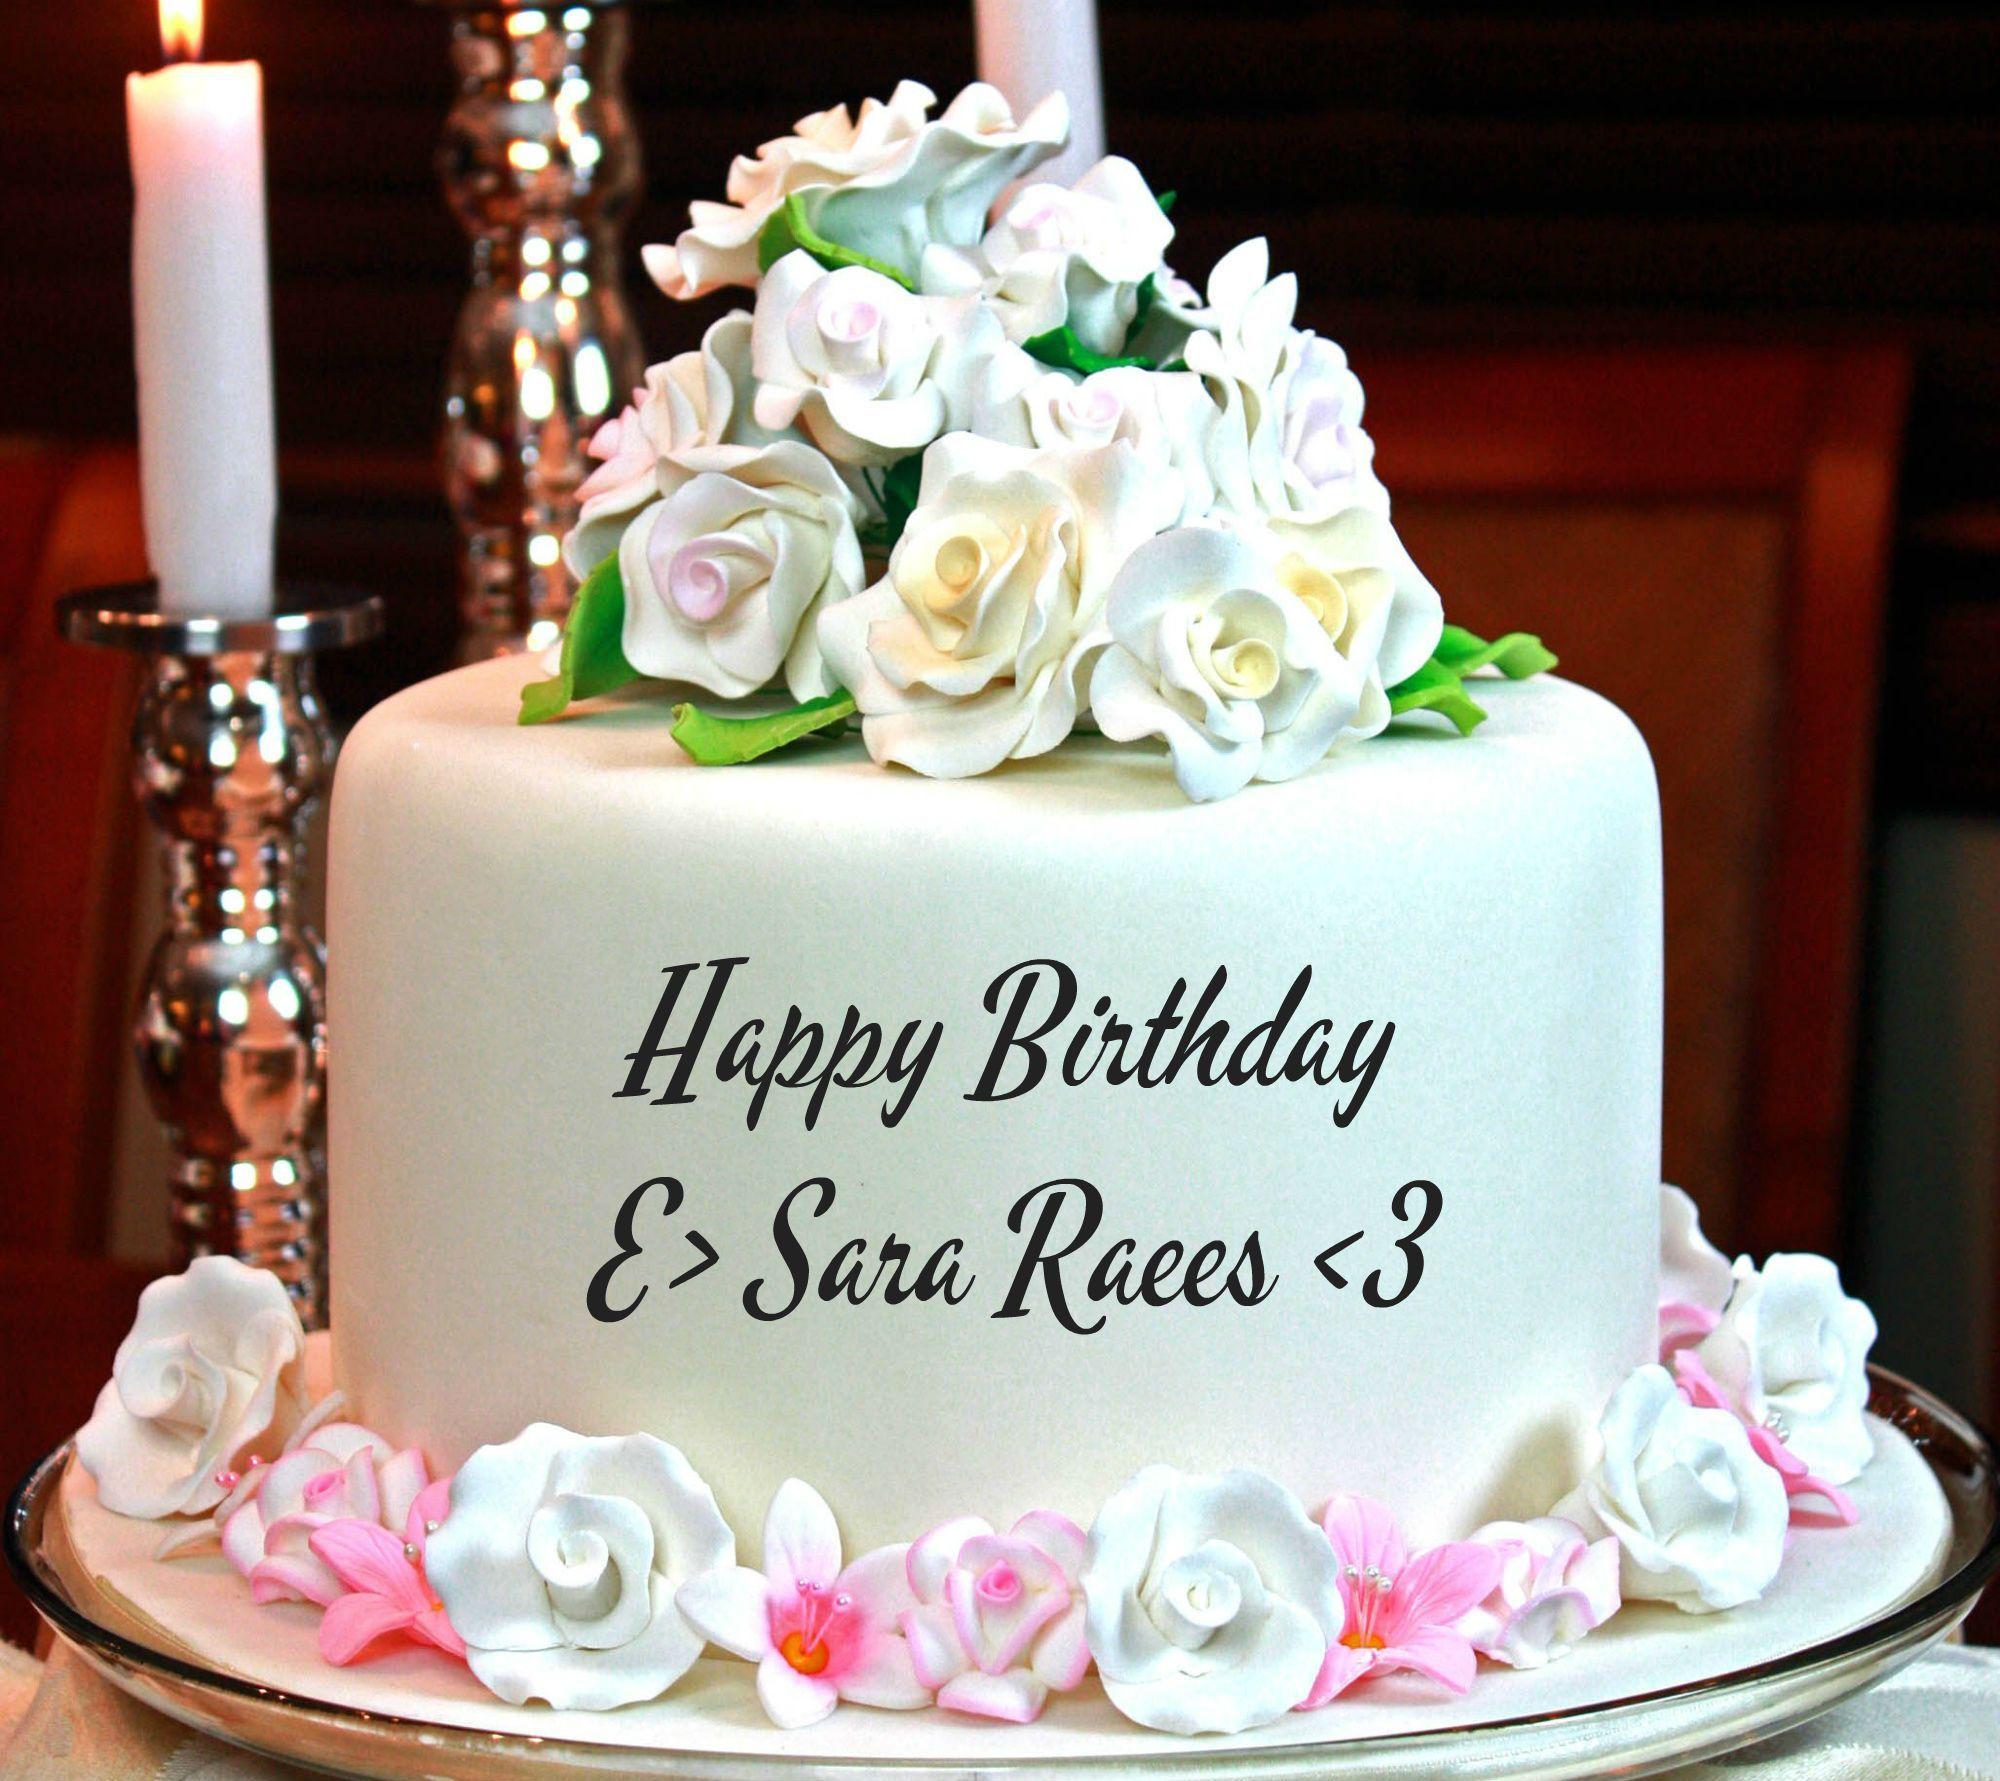 Happy Birthday Sara Raees